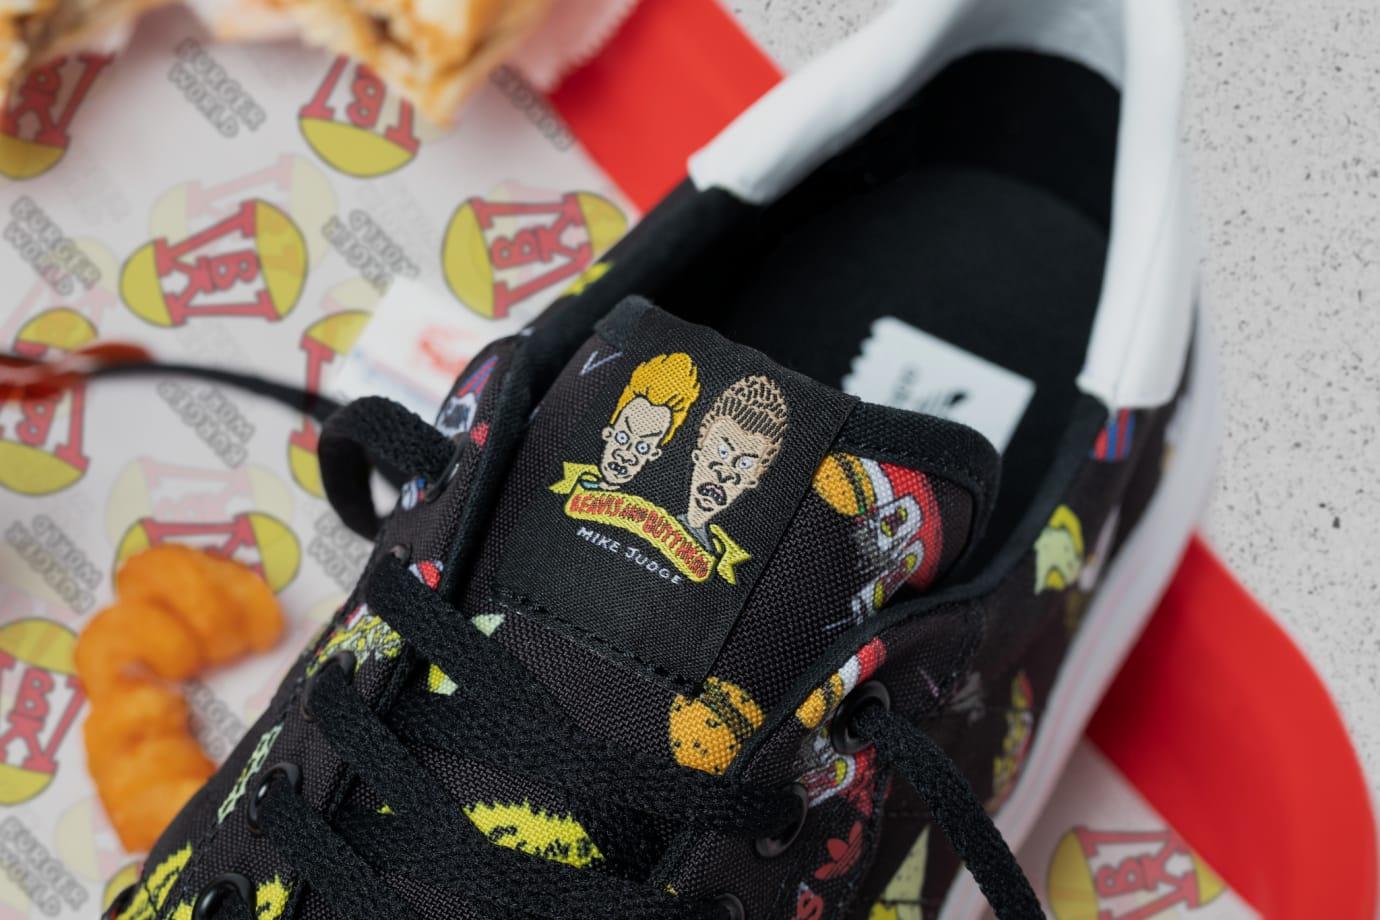 beavis-and-butthead-adidas-3mc-tongue